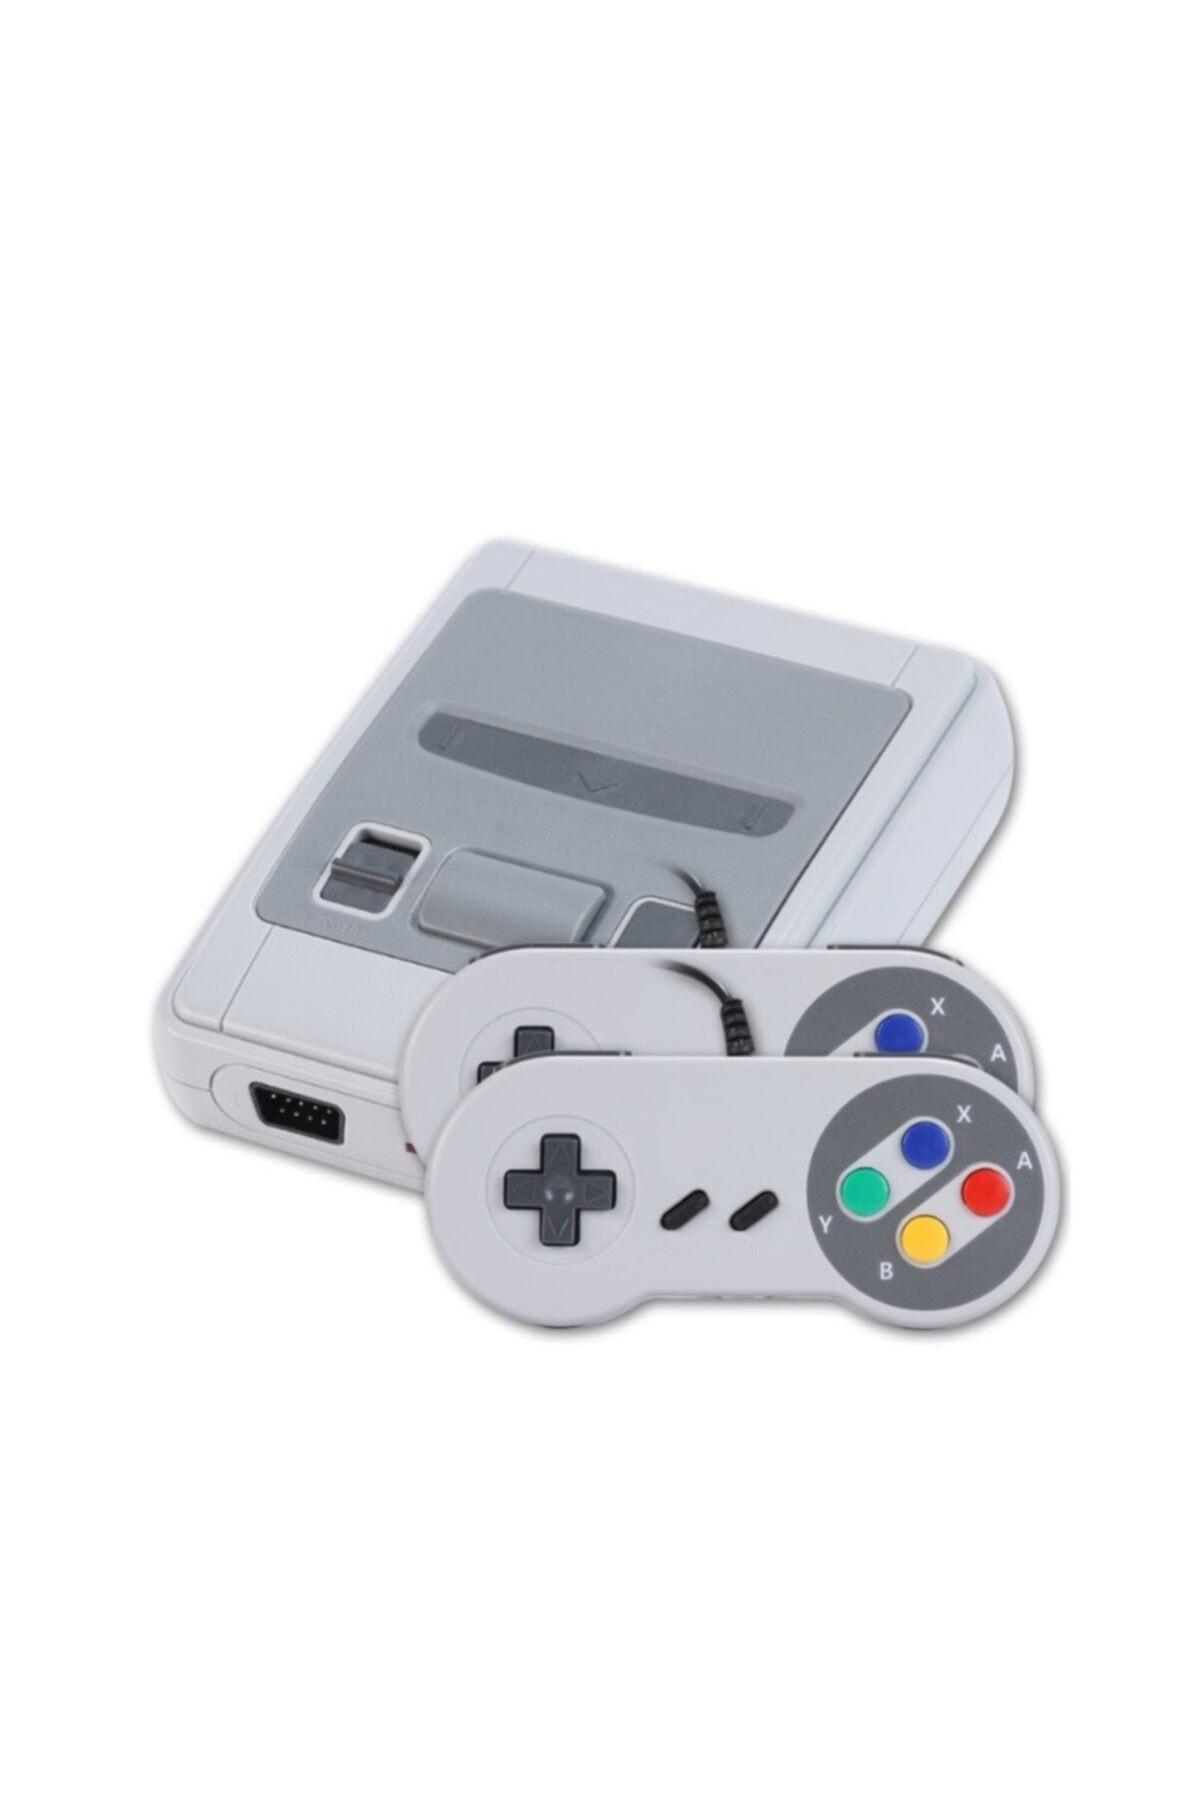 ATARI 621 Nostalji Oyunlu Atari Gameboy & Gamebox Oyun Konsolu 1